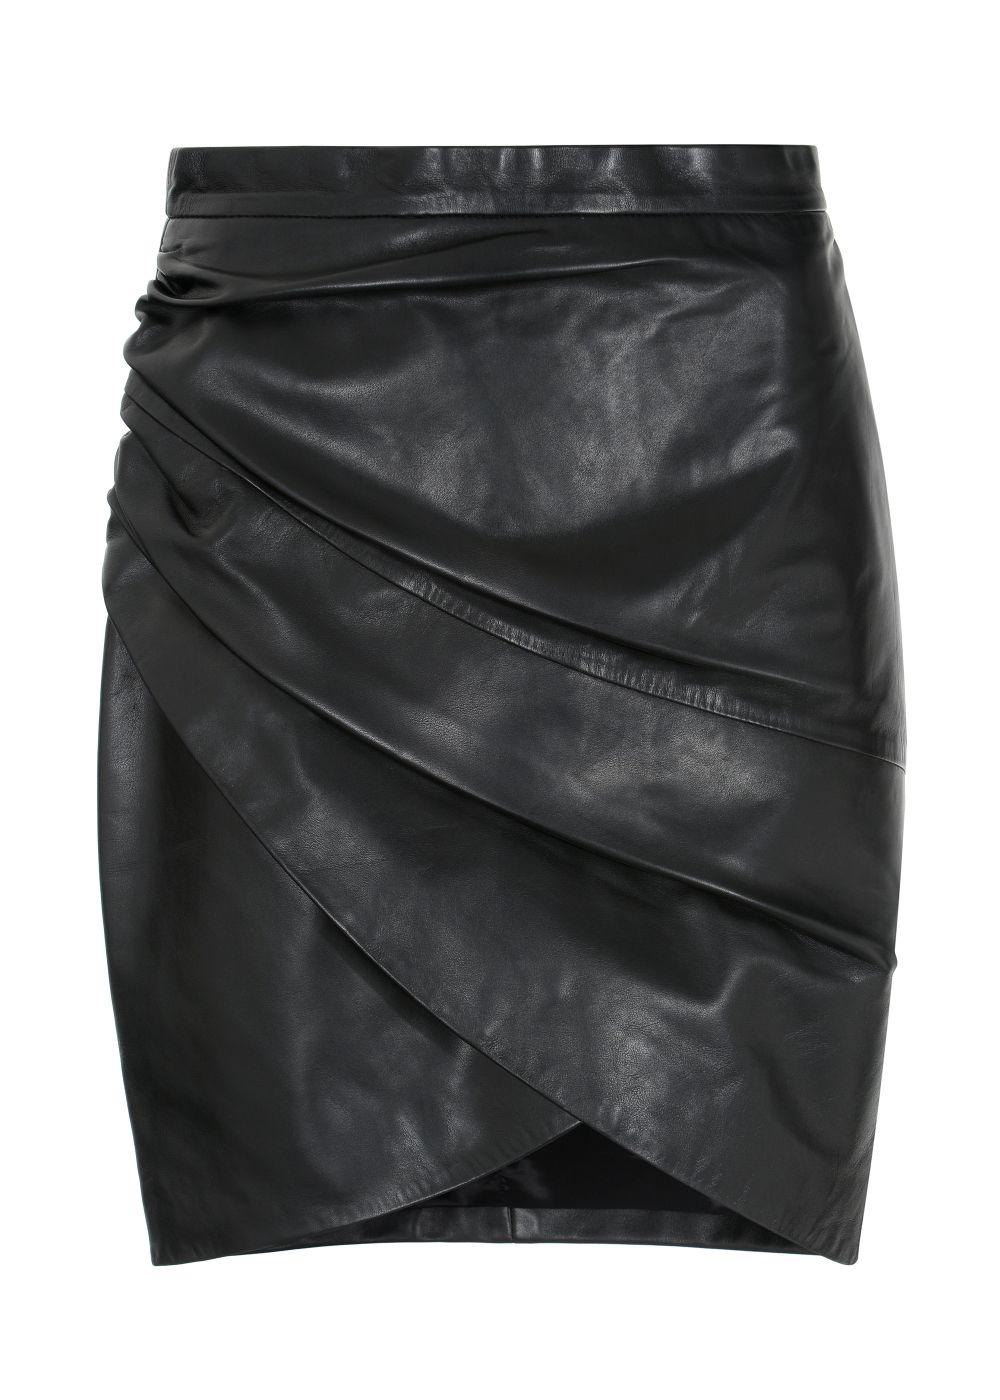 Spódnica damska SPCDS-0046-5339(Z20)